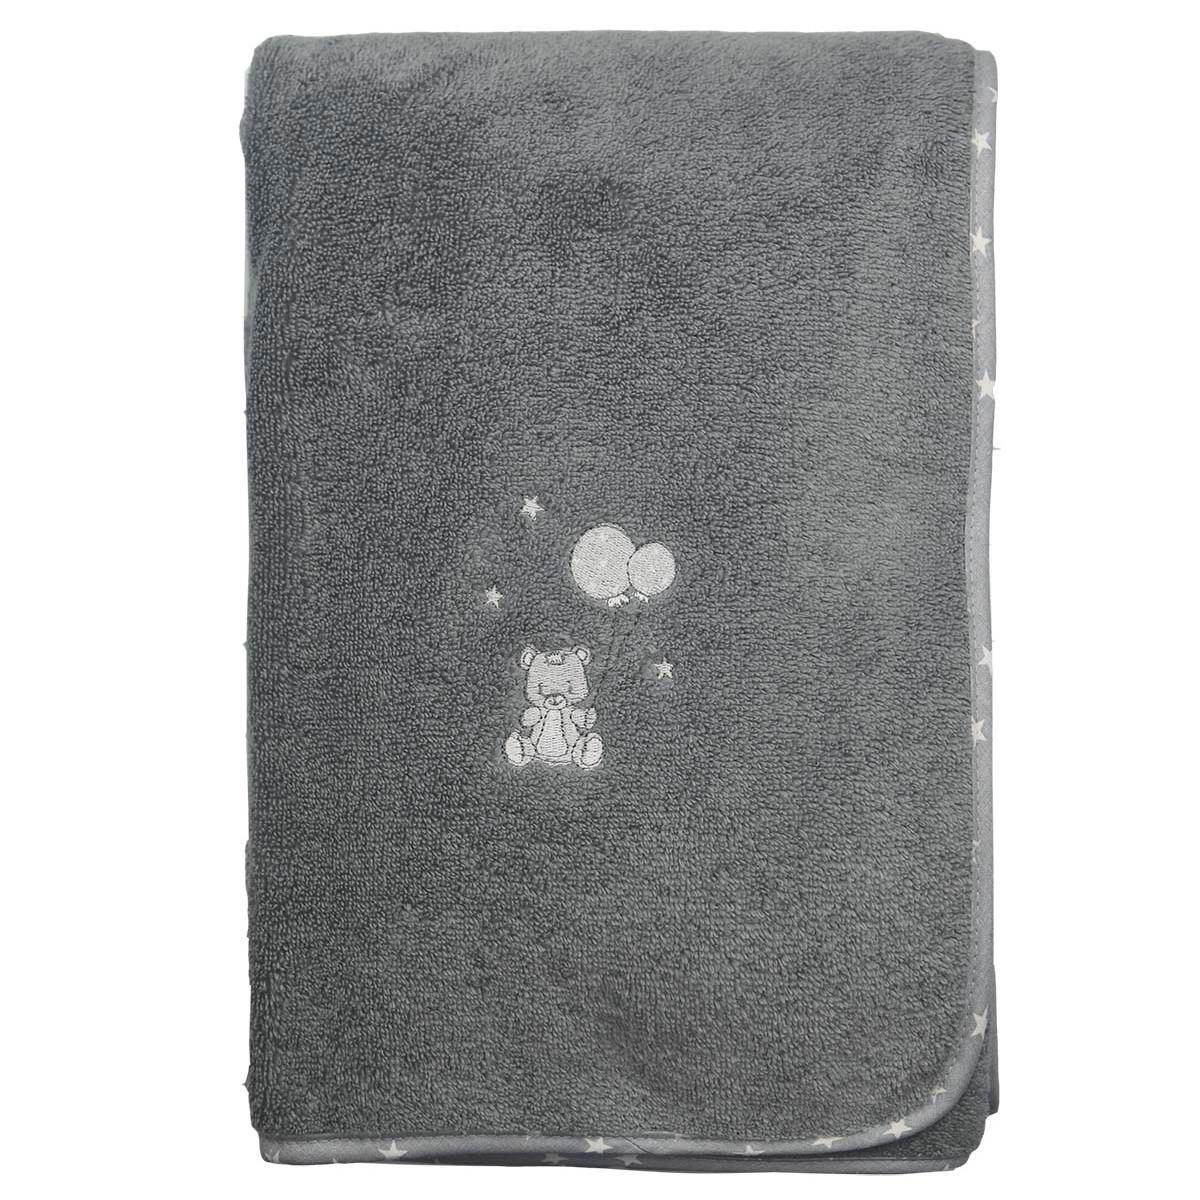 Drap de bain en coton peigné  Galet 70x130 cm